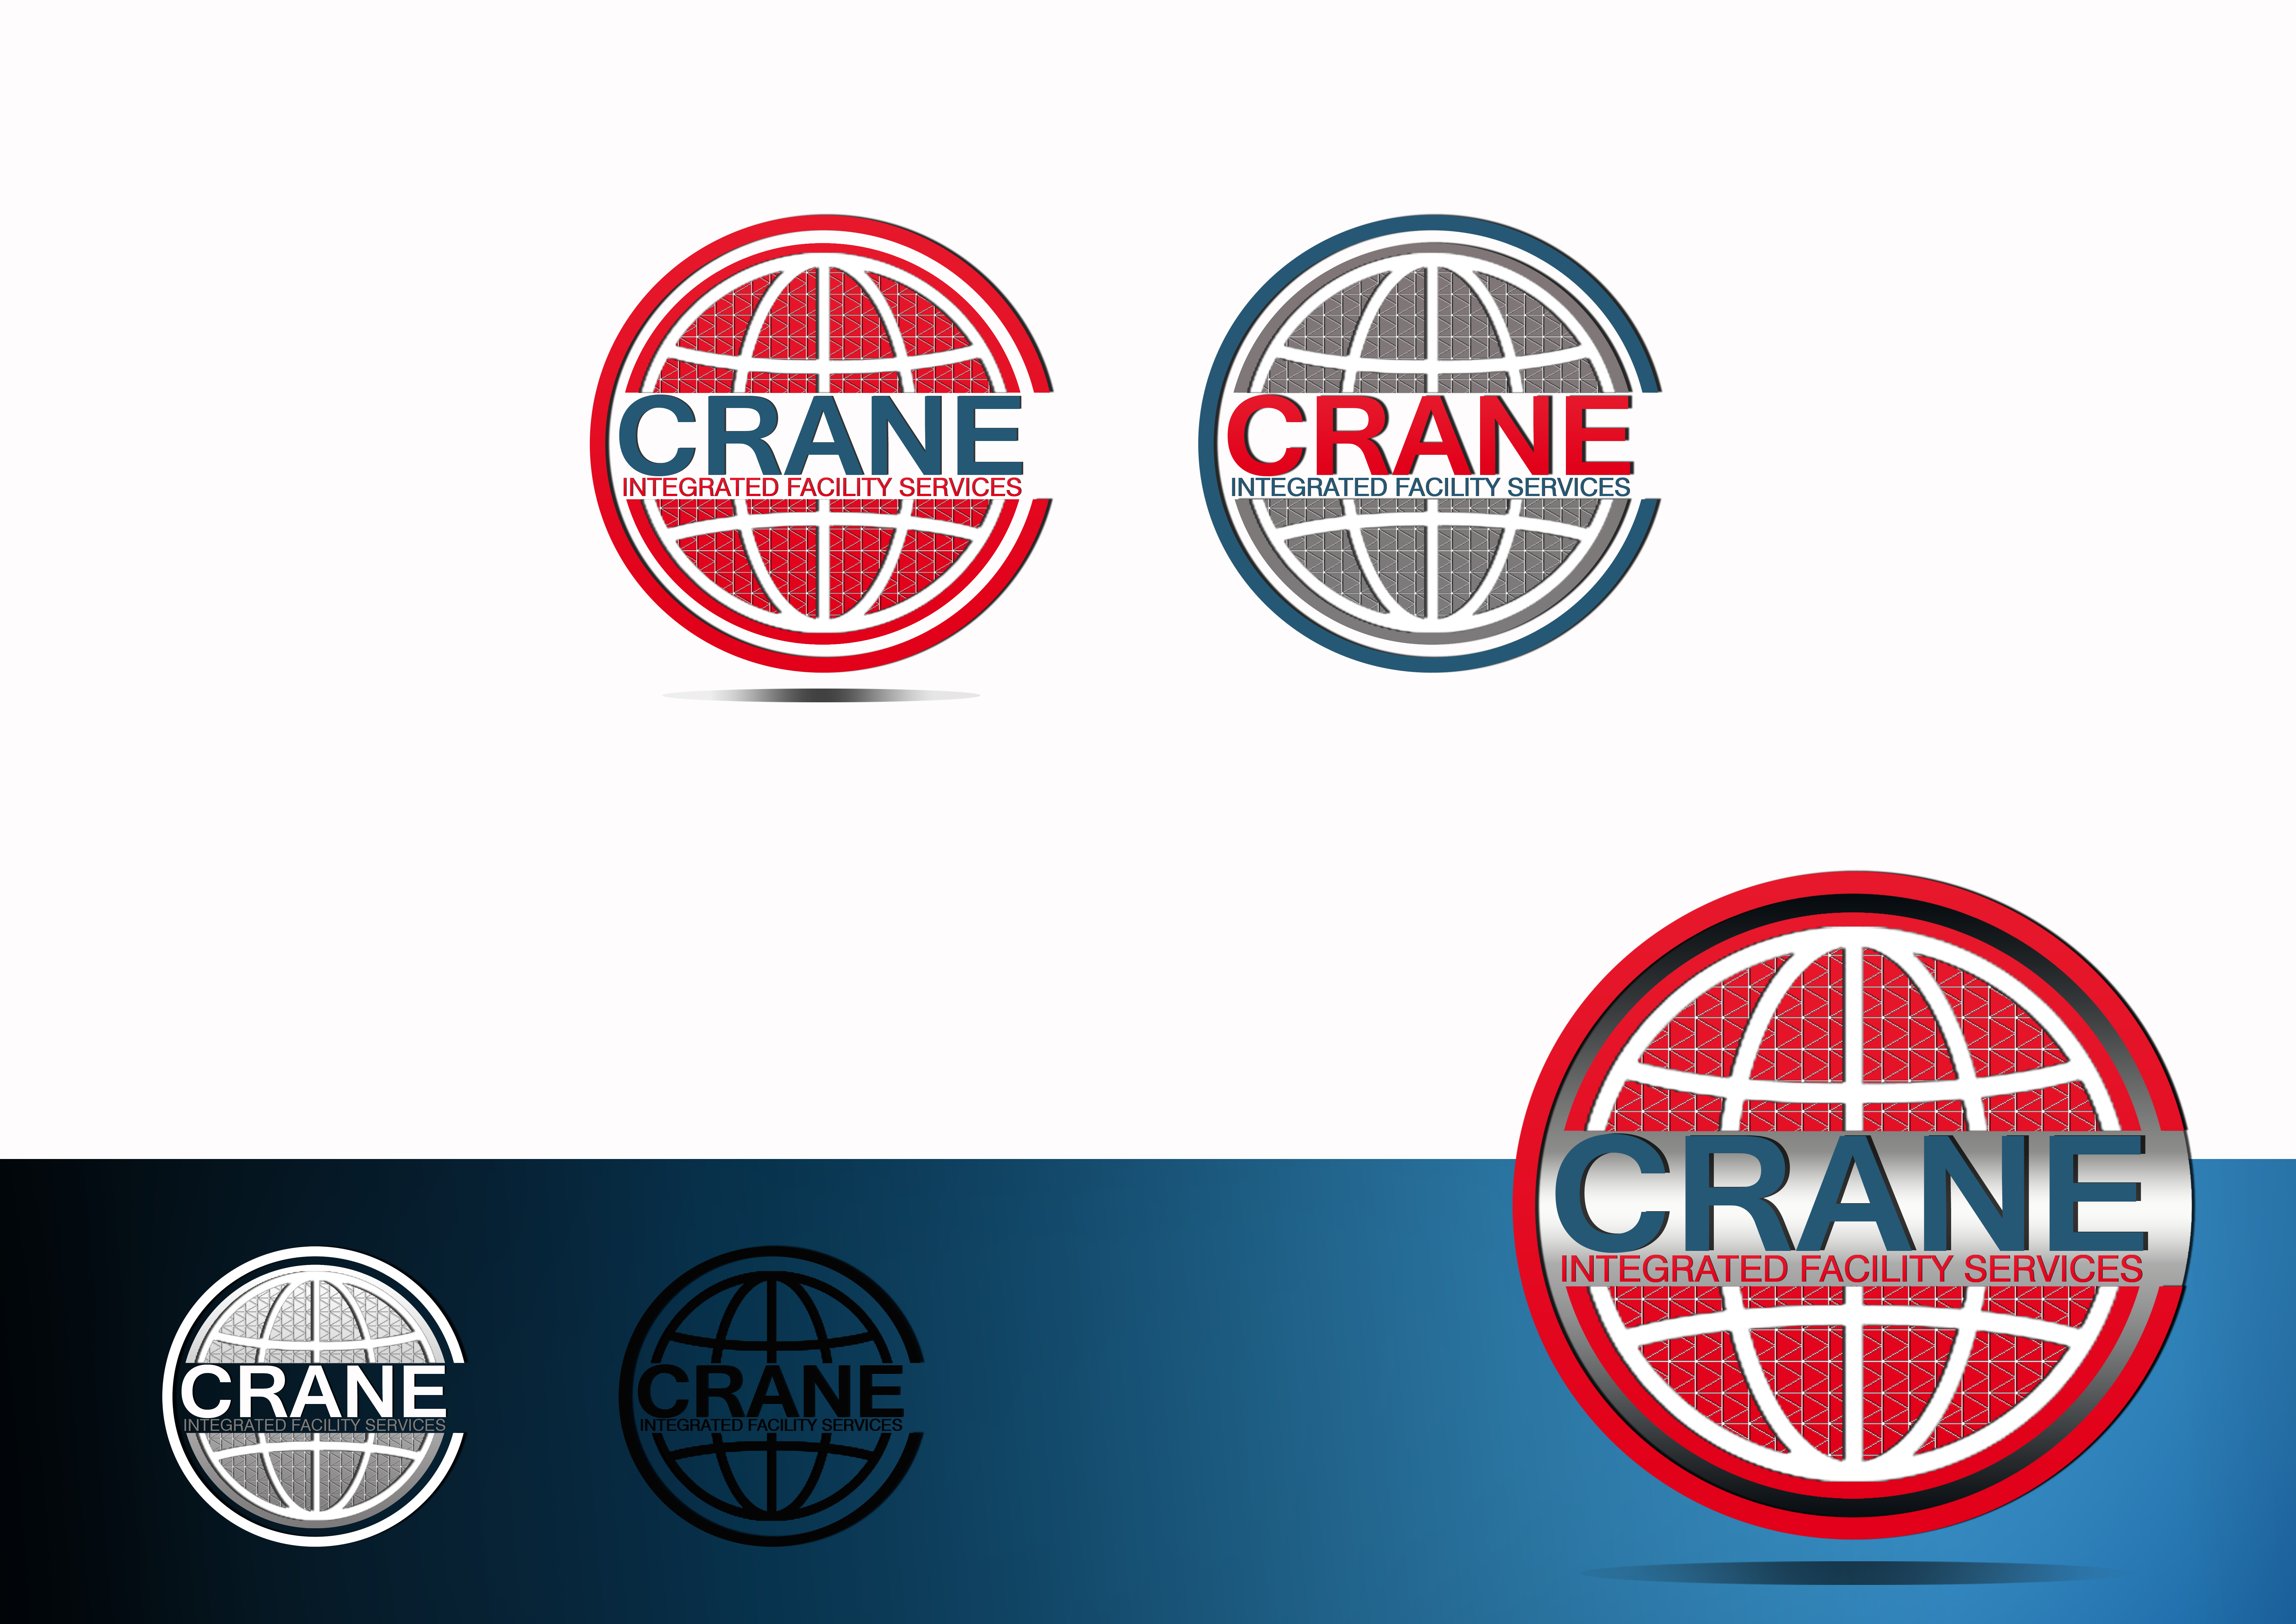 Logo Design by JSDESIGNGROUP - Entry No. 77 in the Logo Design Contest Inspiring Logo Design for Crane Integrated Facility Services.